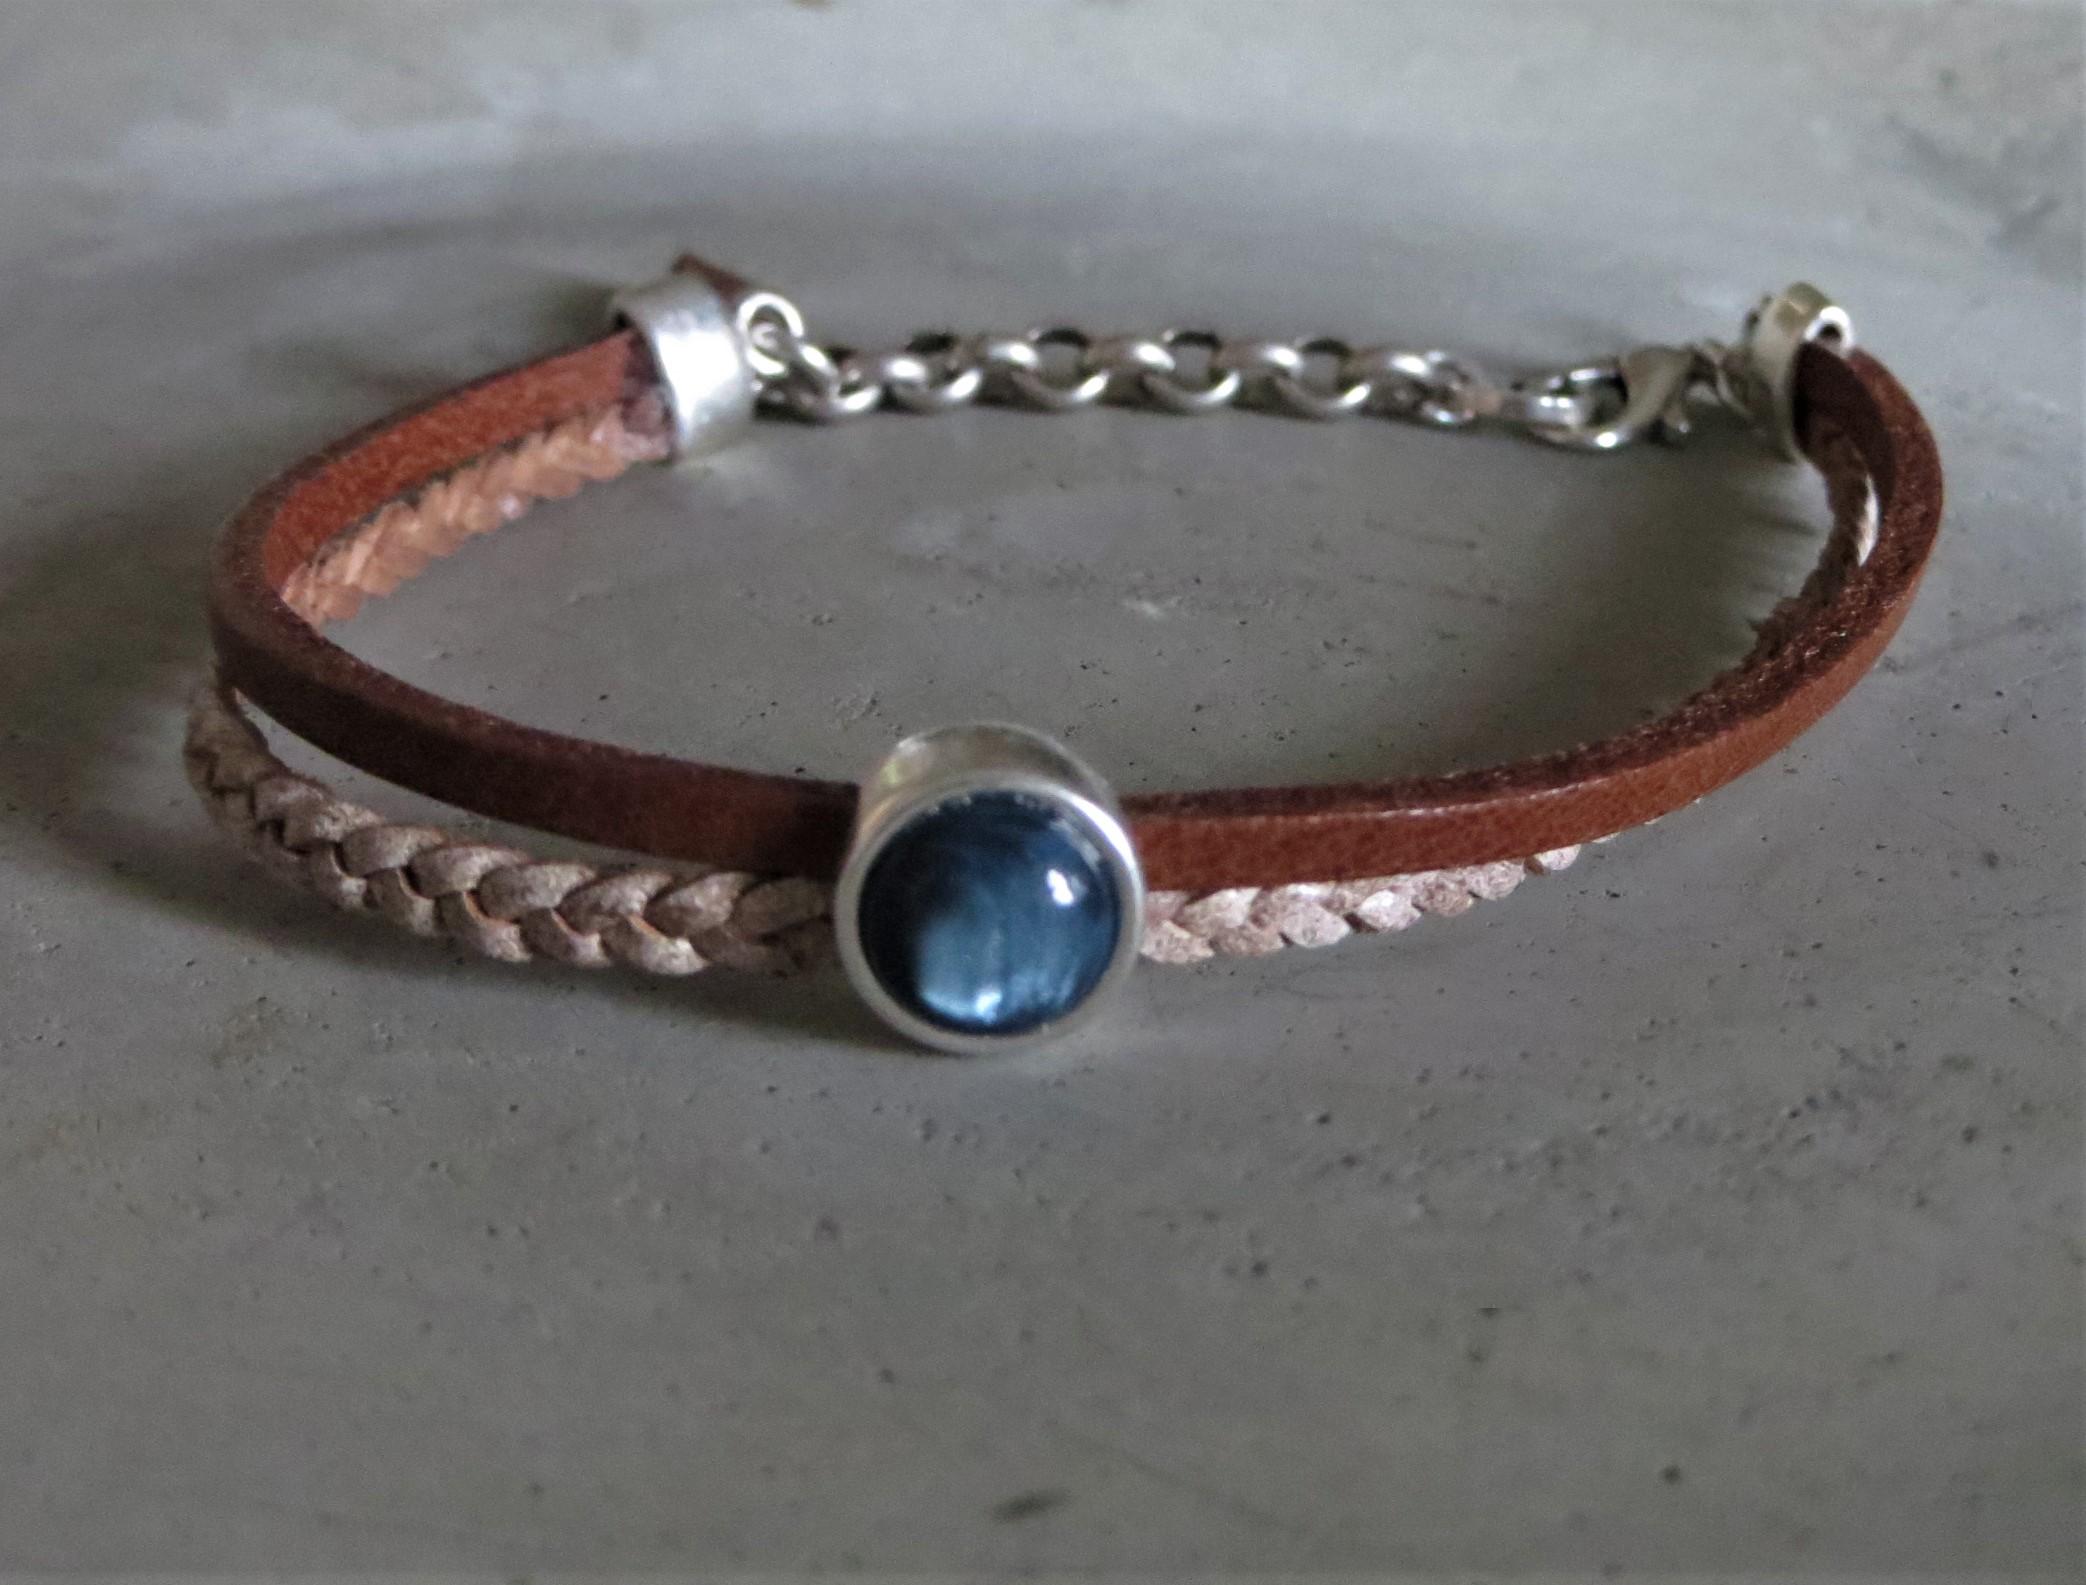 Armbaender - QOSS Armband FLEUR Braun Jeansblau onesize  - Onlineshop Tante Emmer